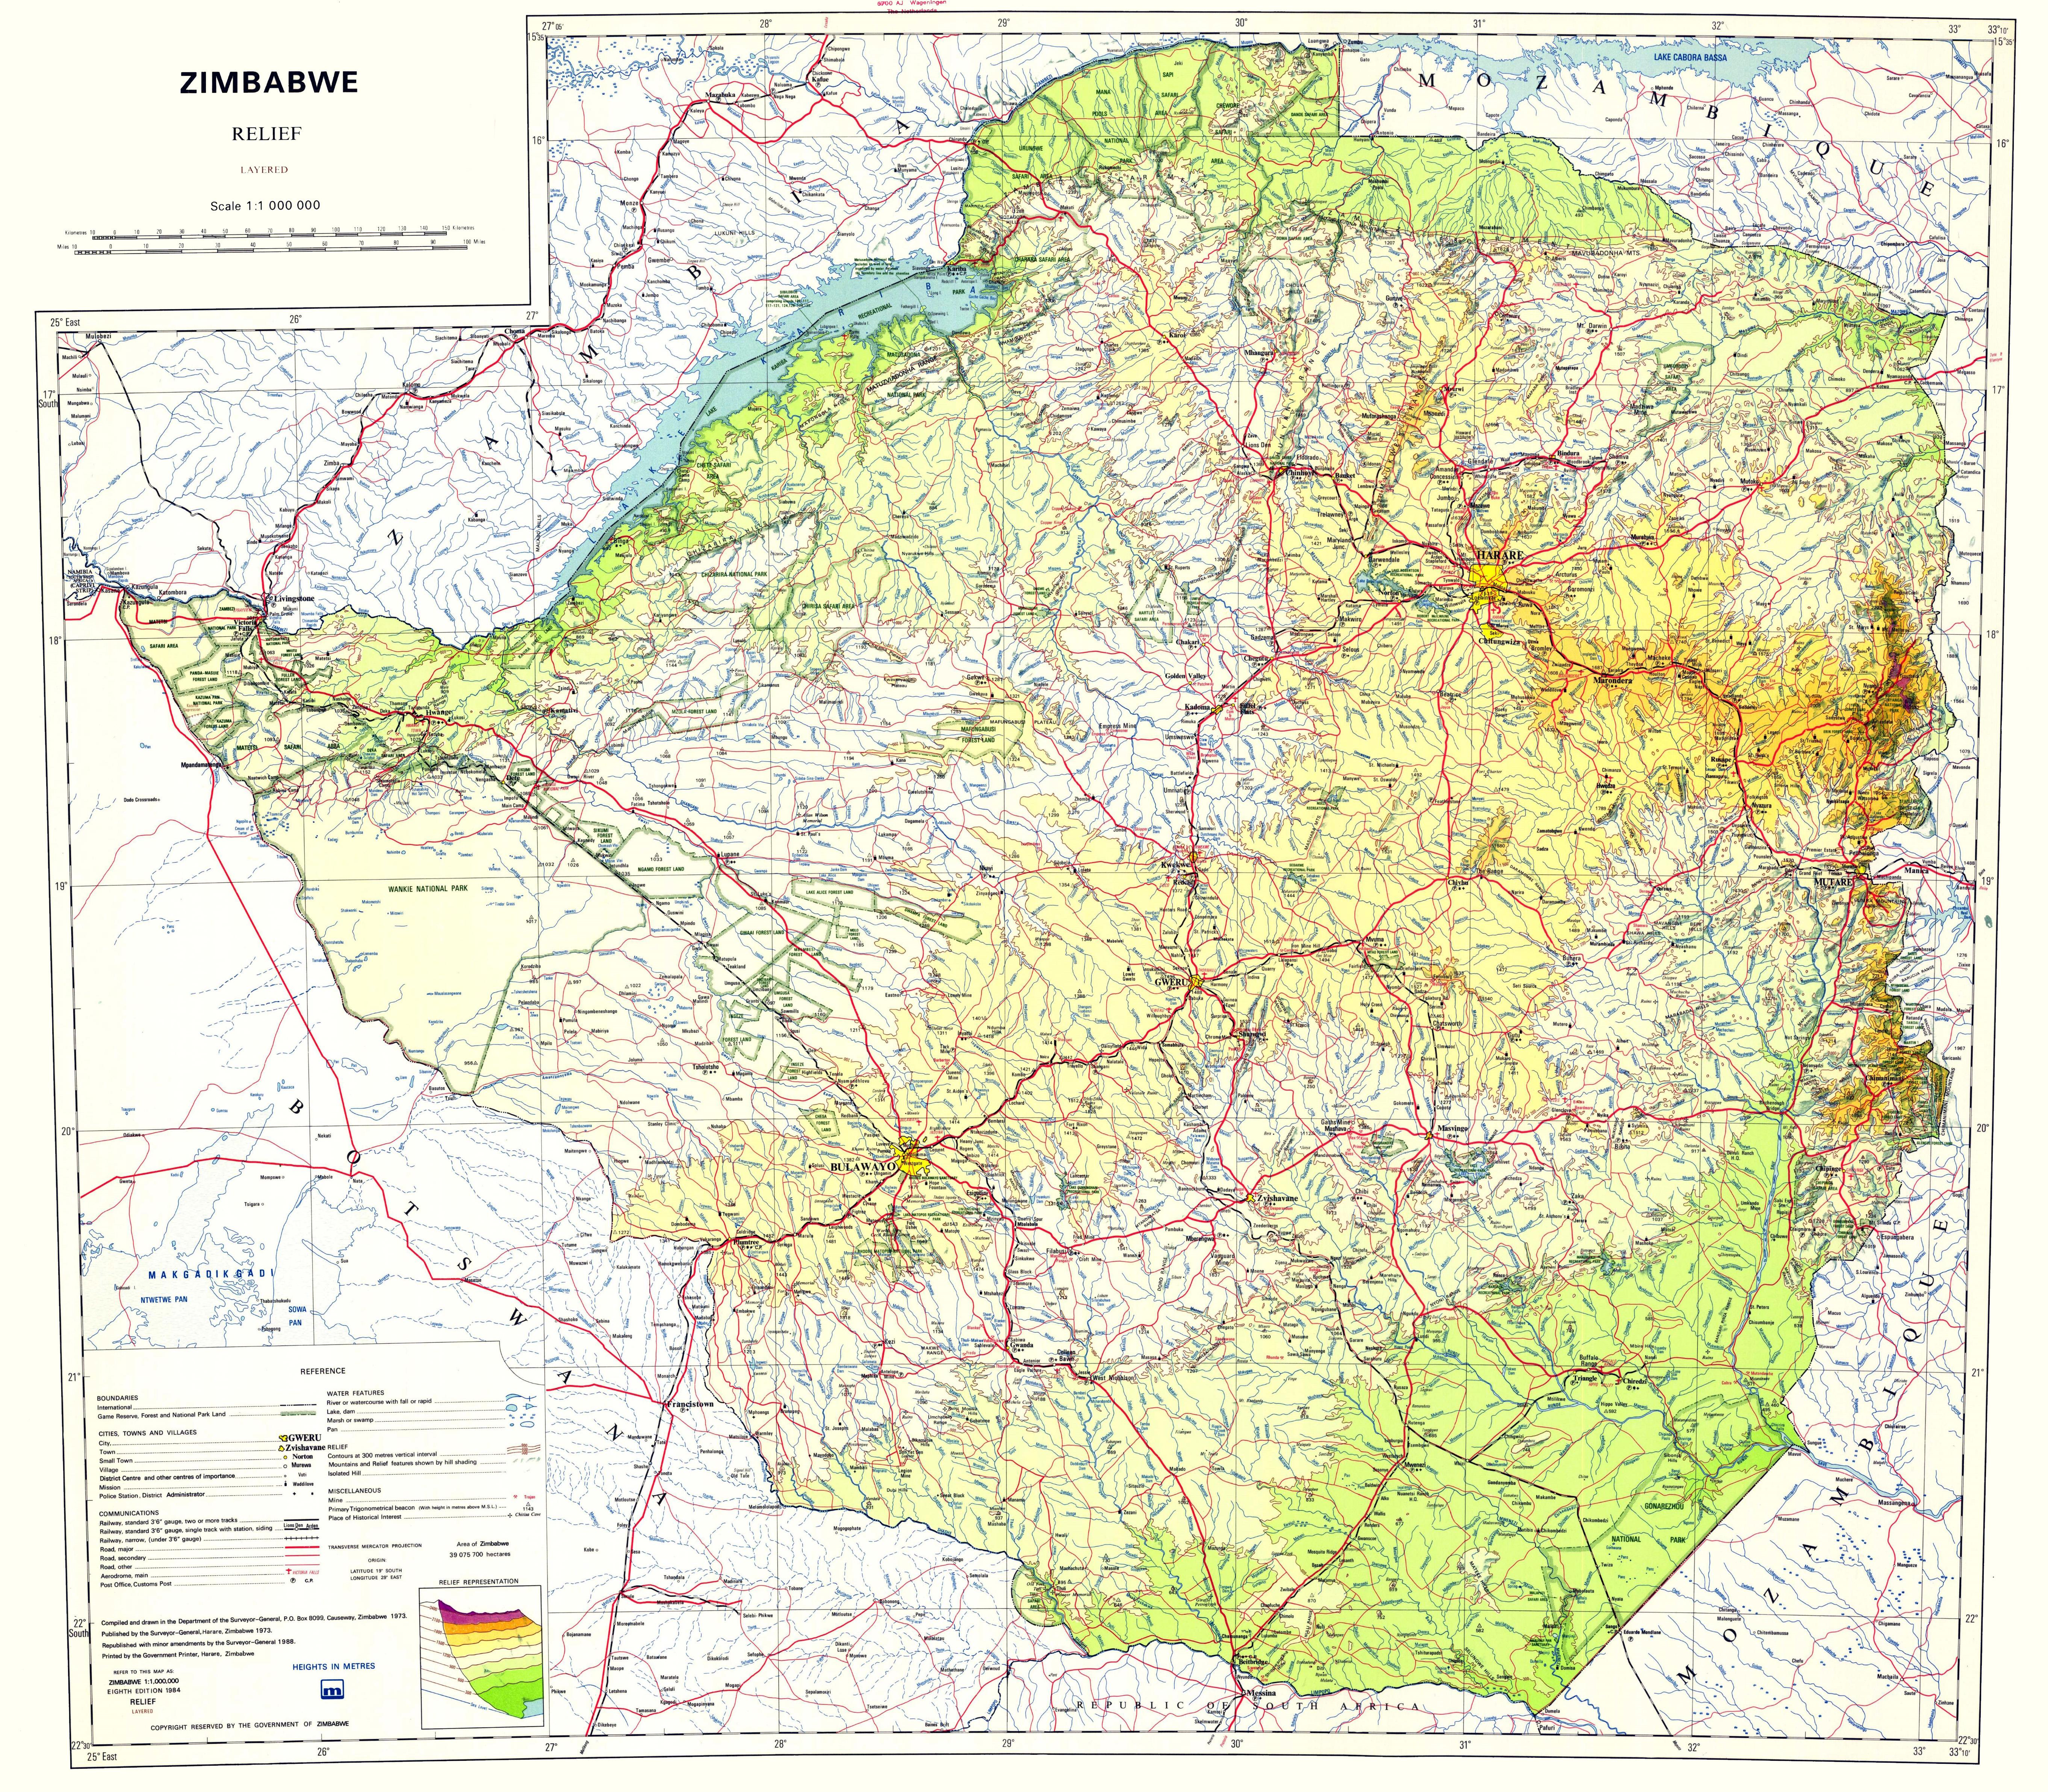 Large scale relief map of Zimbabwe with other marks | Zimbabwe ...